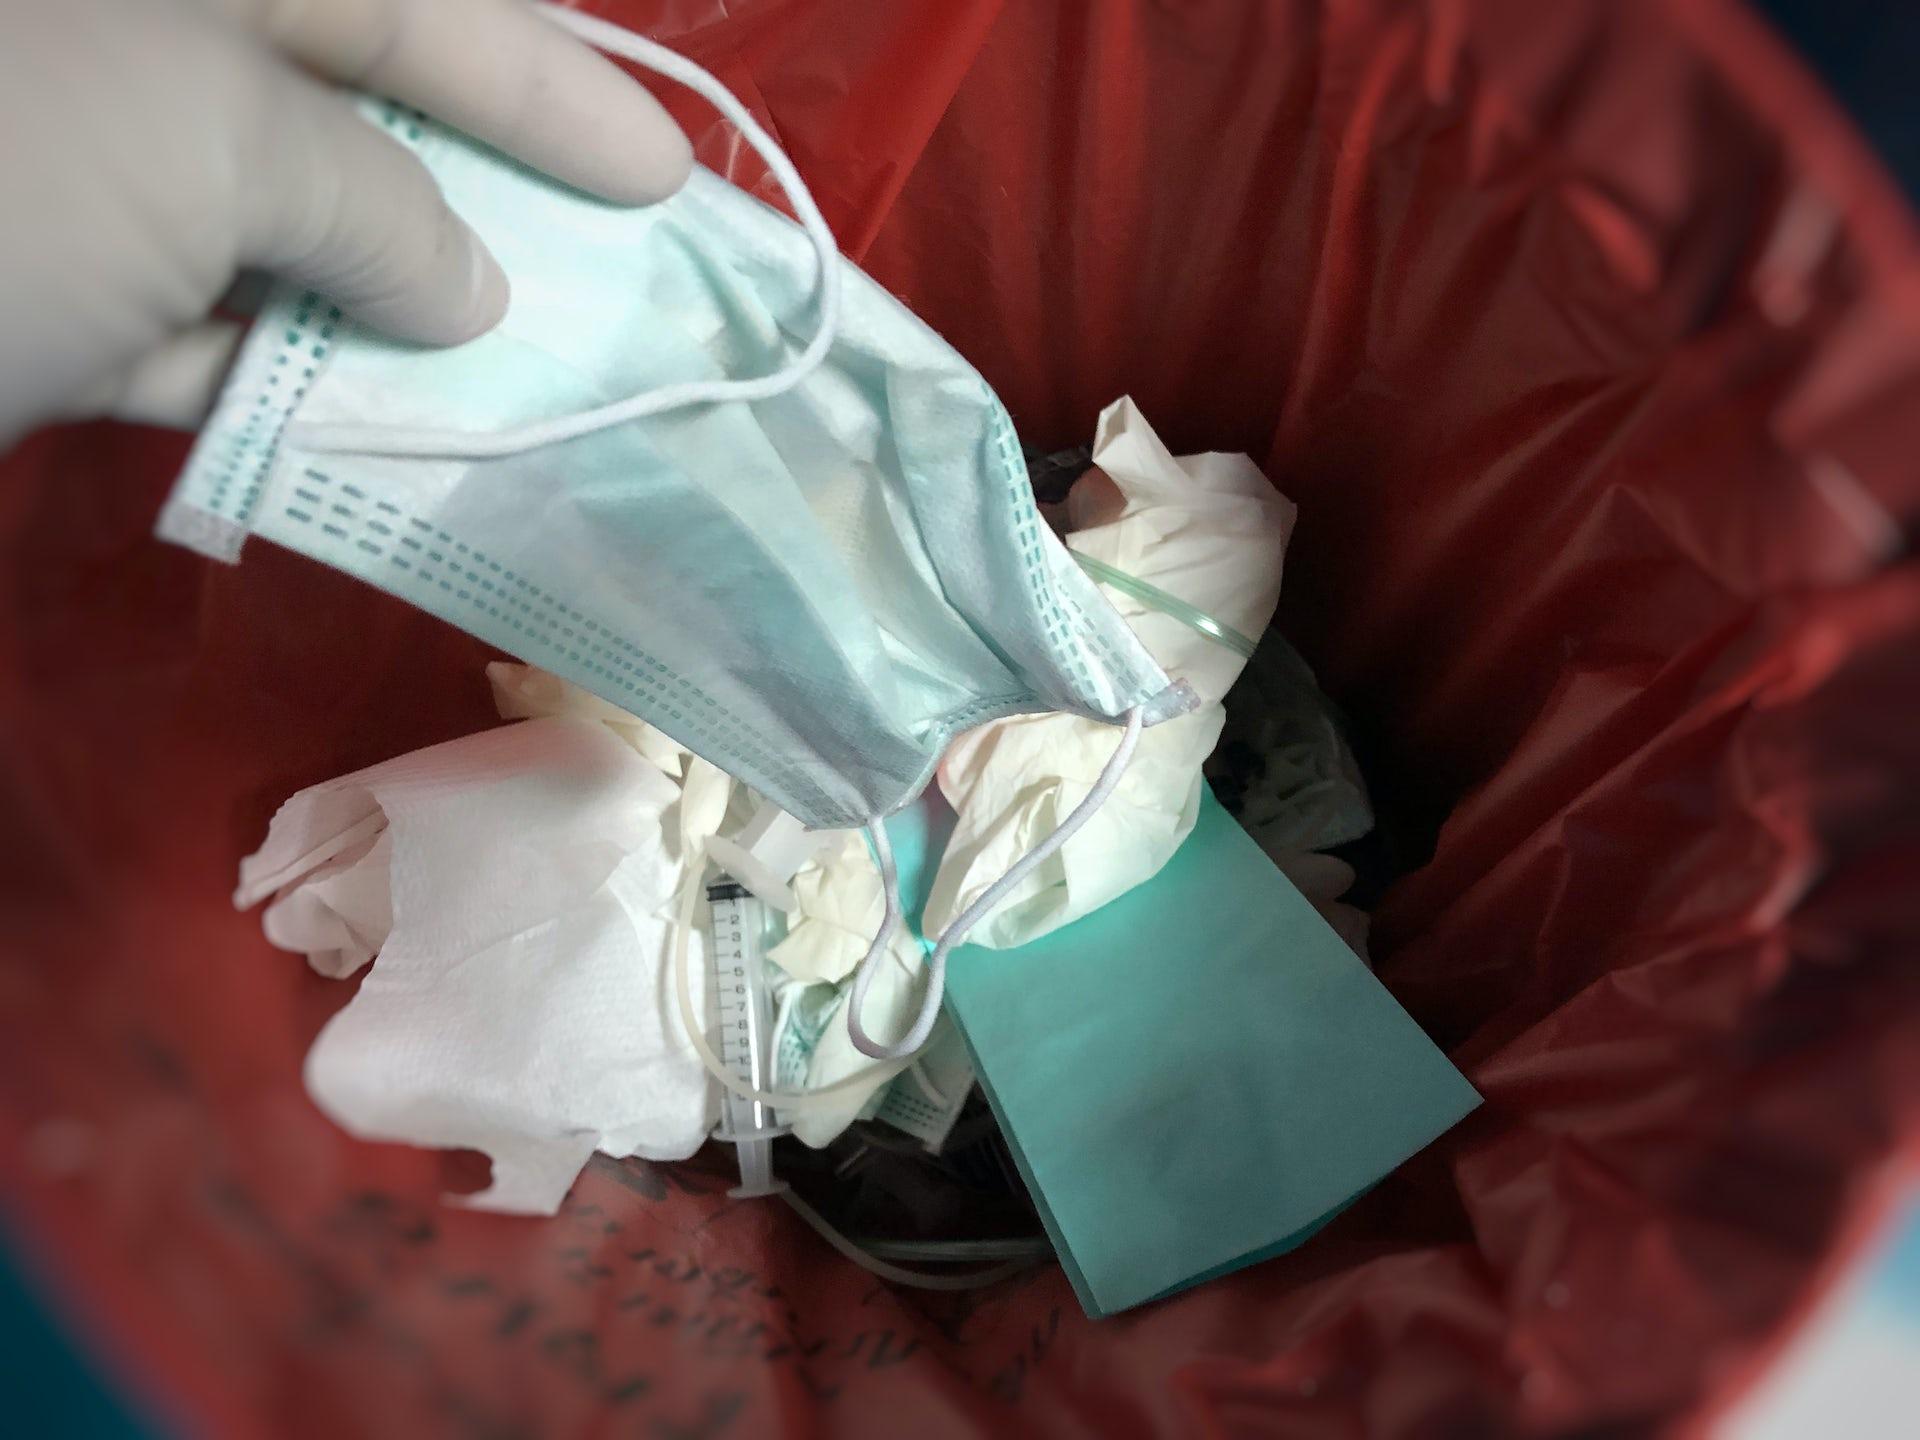 Five ways hospitals can reduce their environmental footprint